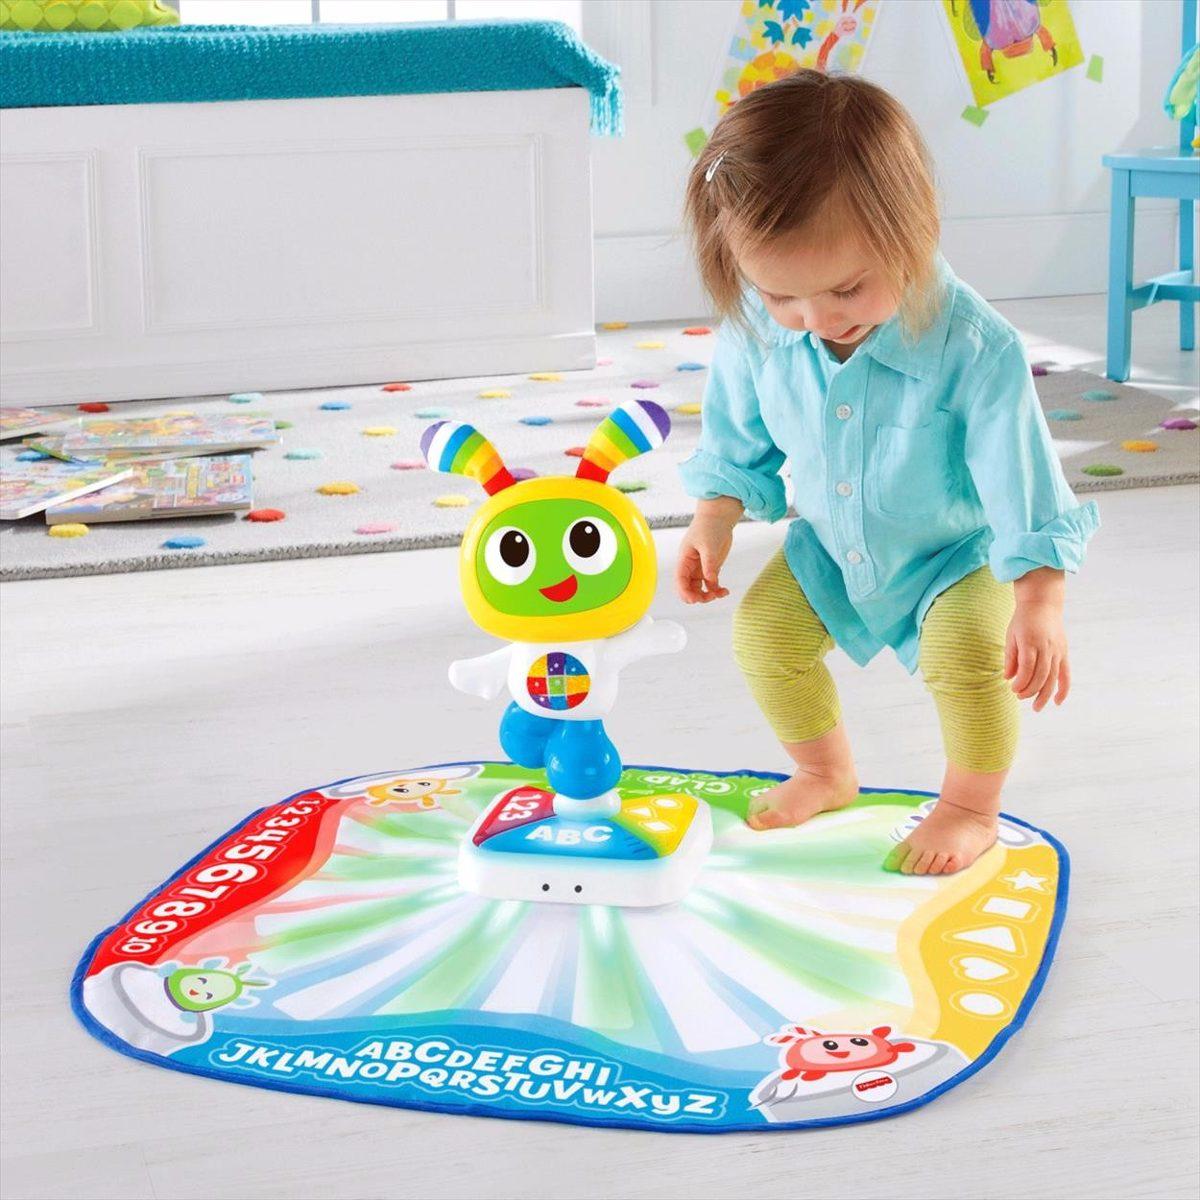 bi bot robot tapete bibot fisher price gimnasio bebe. Black Bedroom Furniture Sets. Home Design Ideas